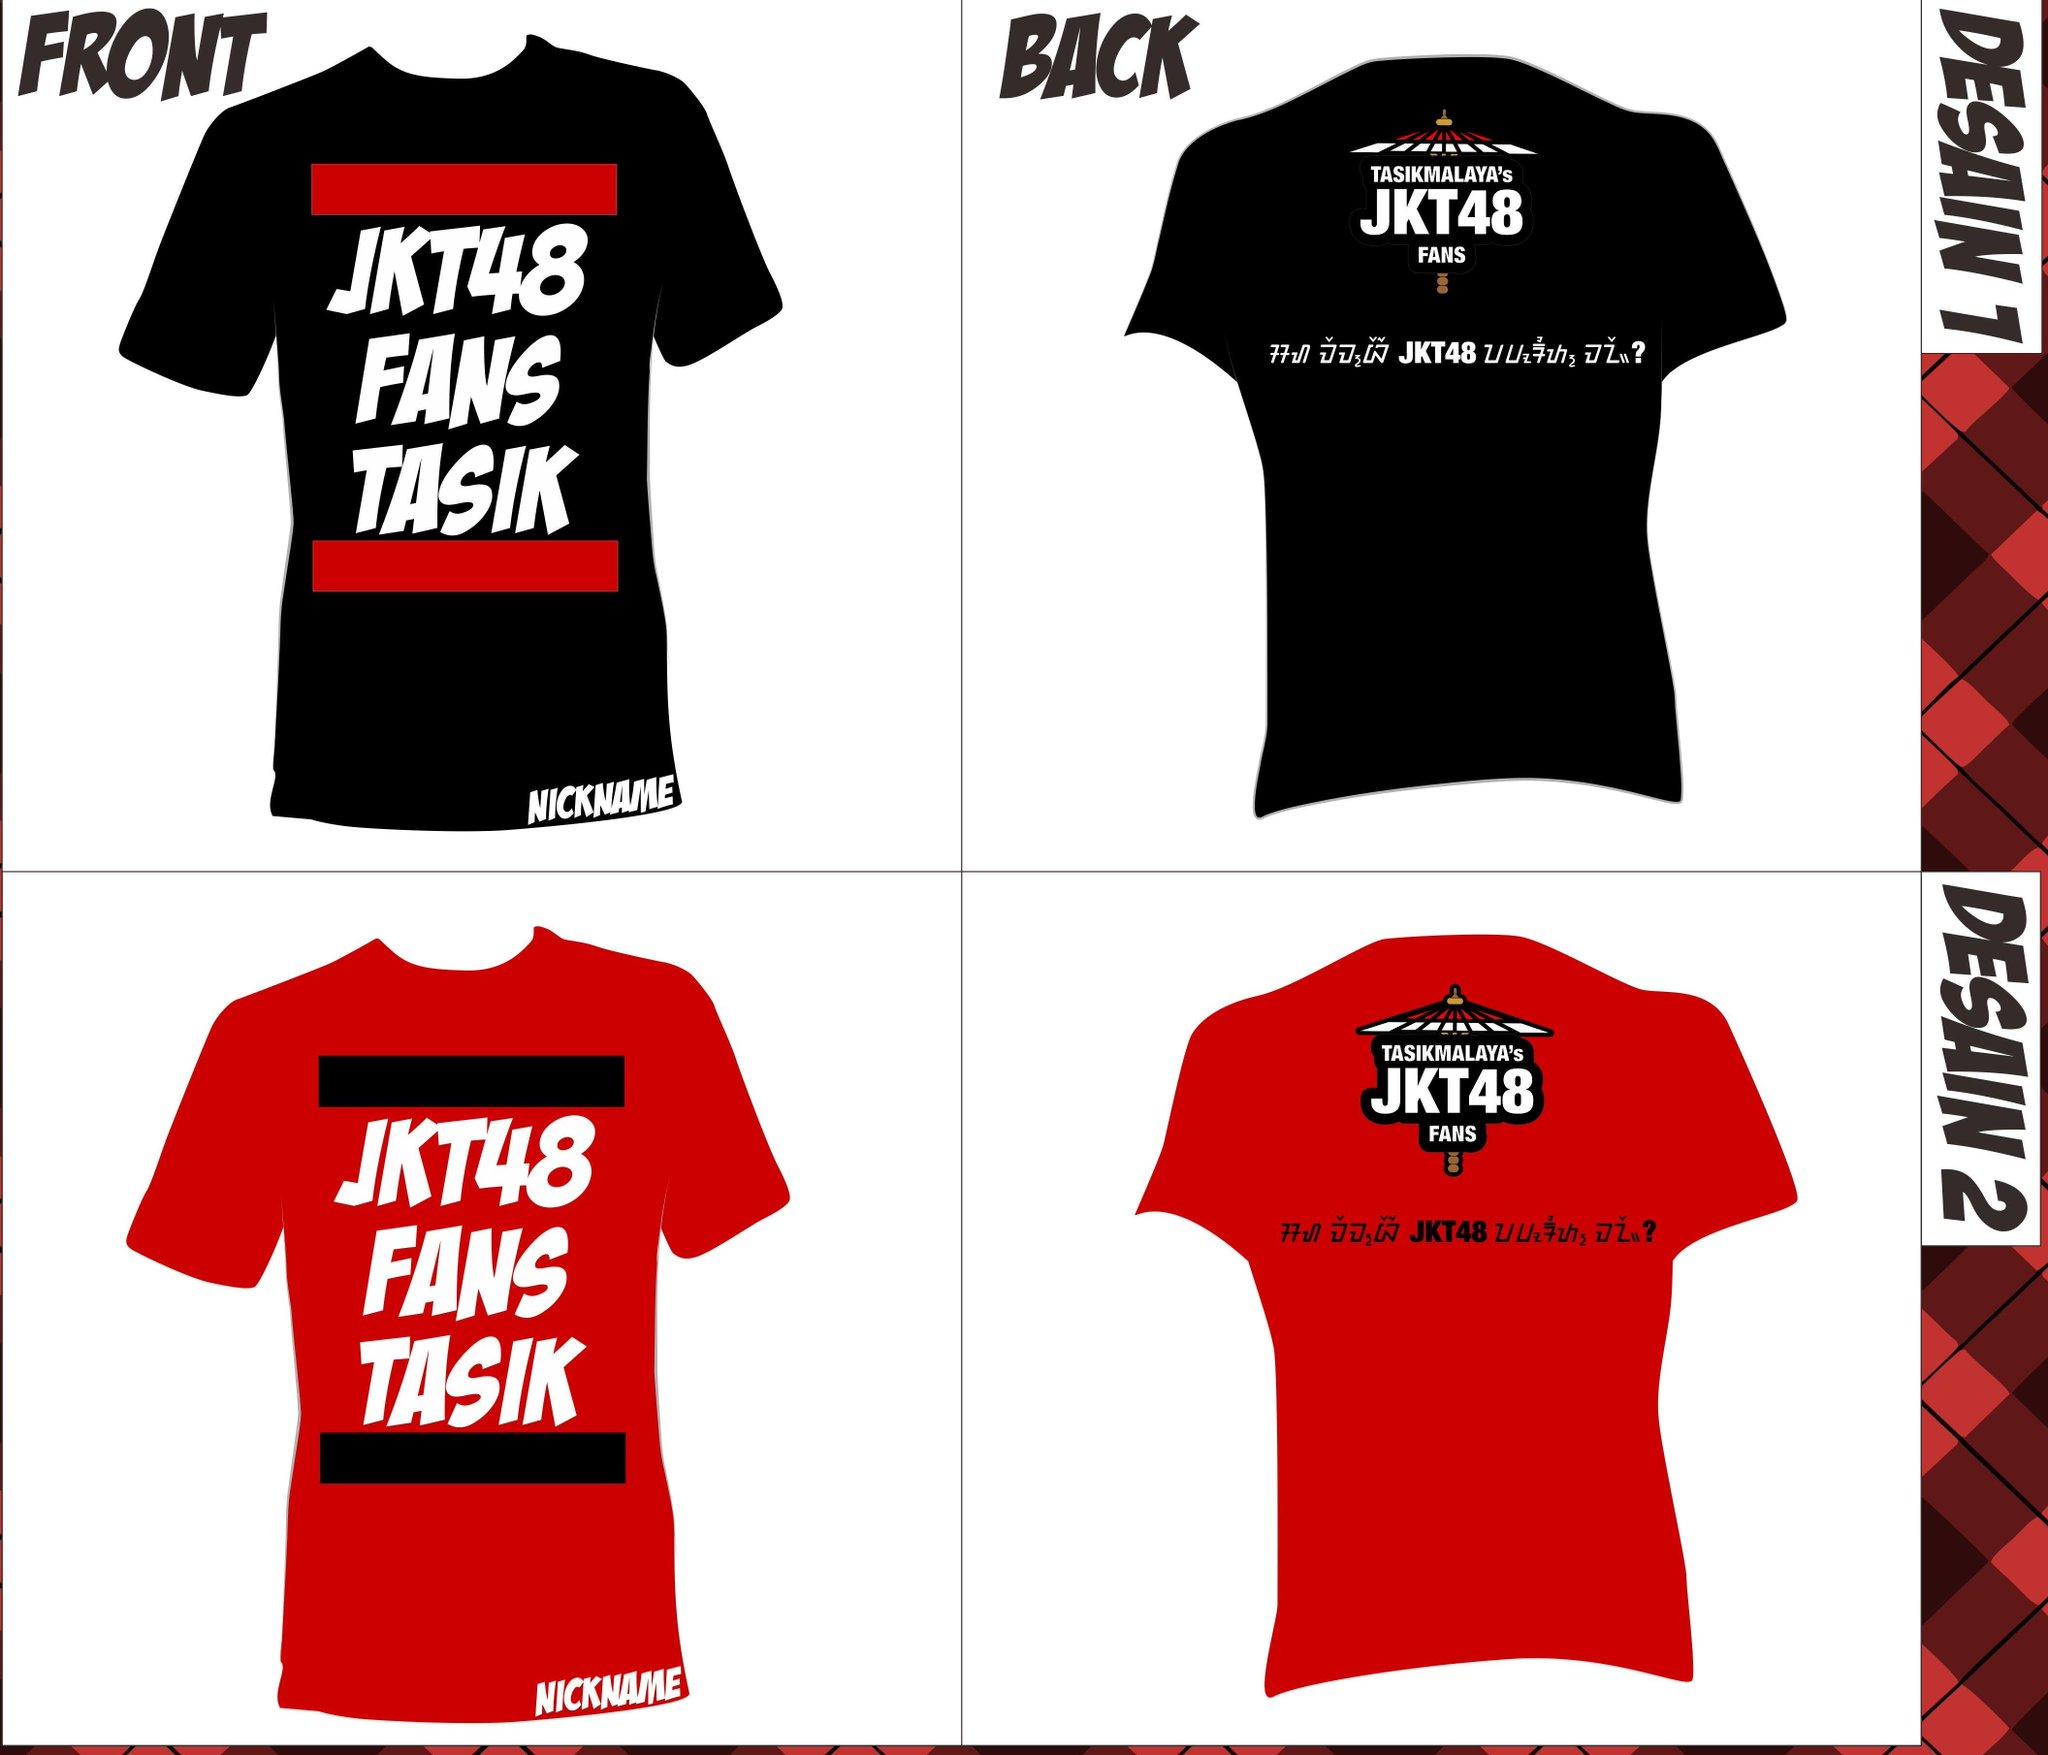 Desain t shirt jkt48 - Jkt48 Fans Tasik On Twitter Ini Untuk Desain Baju Jkt48 Tasikmalaya Fanbase Nya Http T Co Ijpxiaxwyw